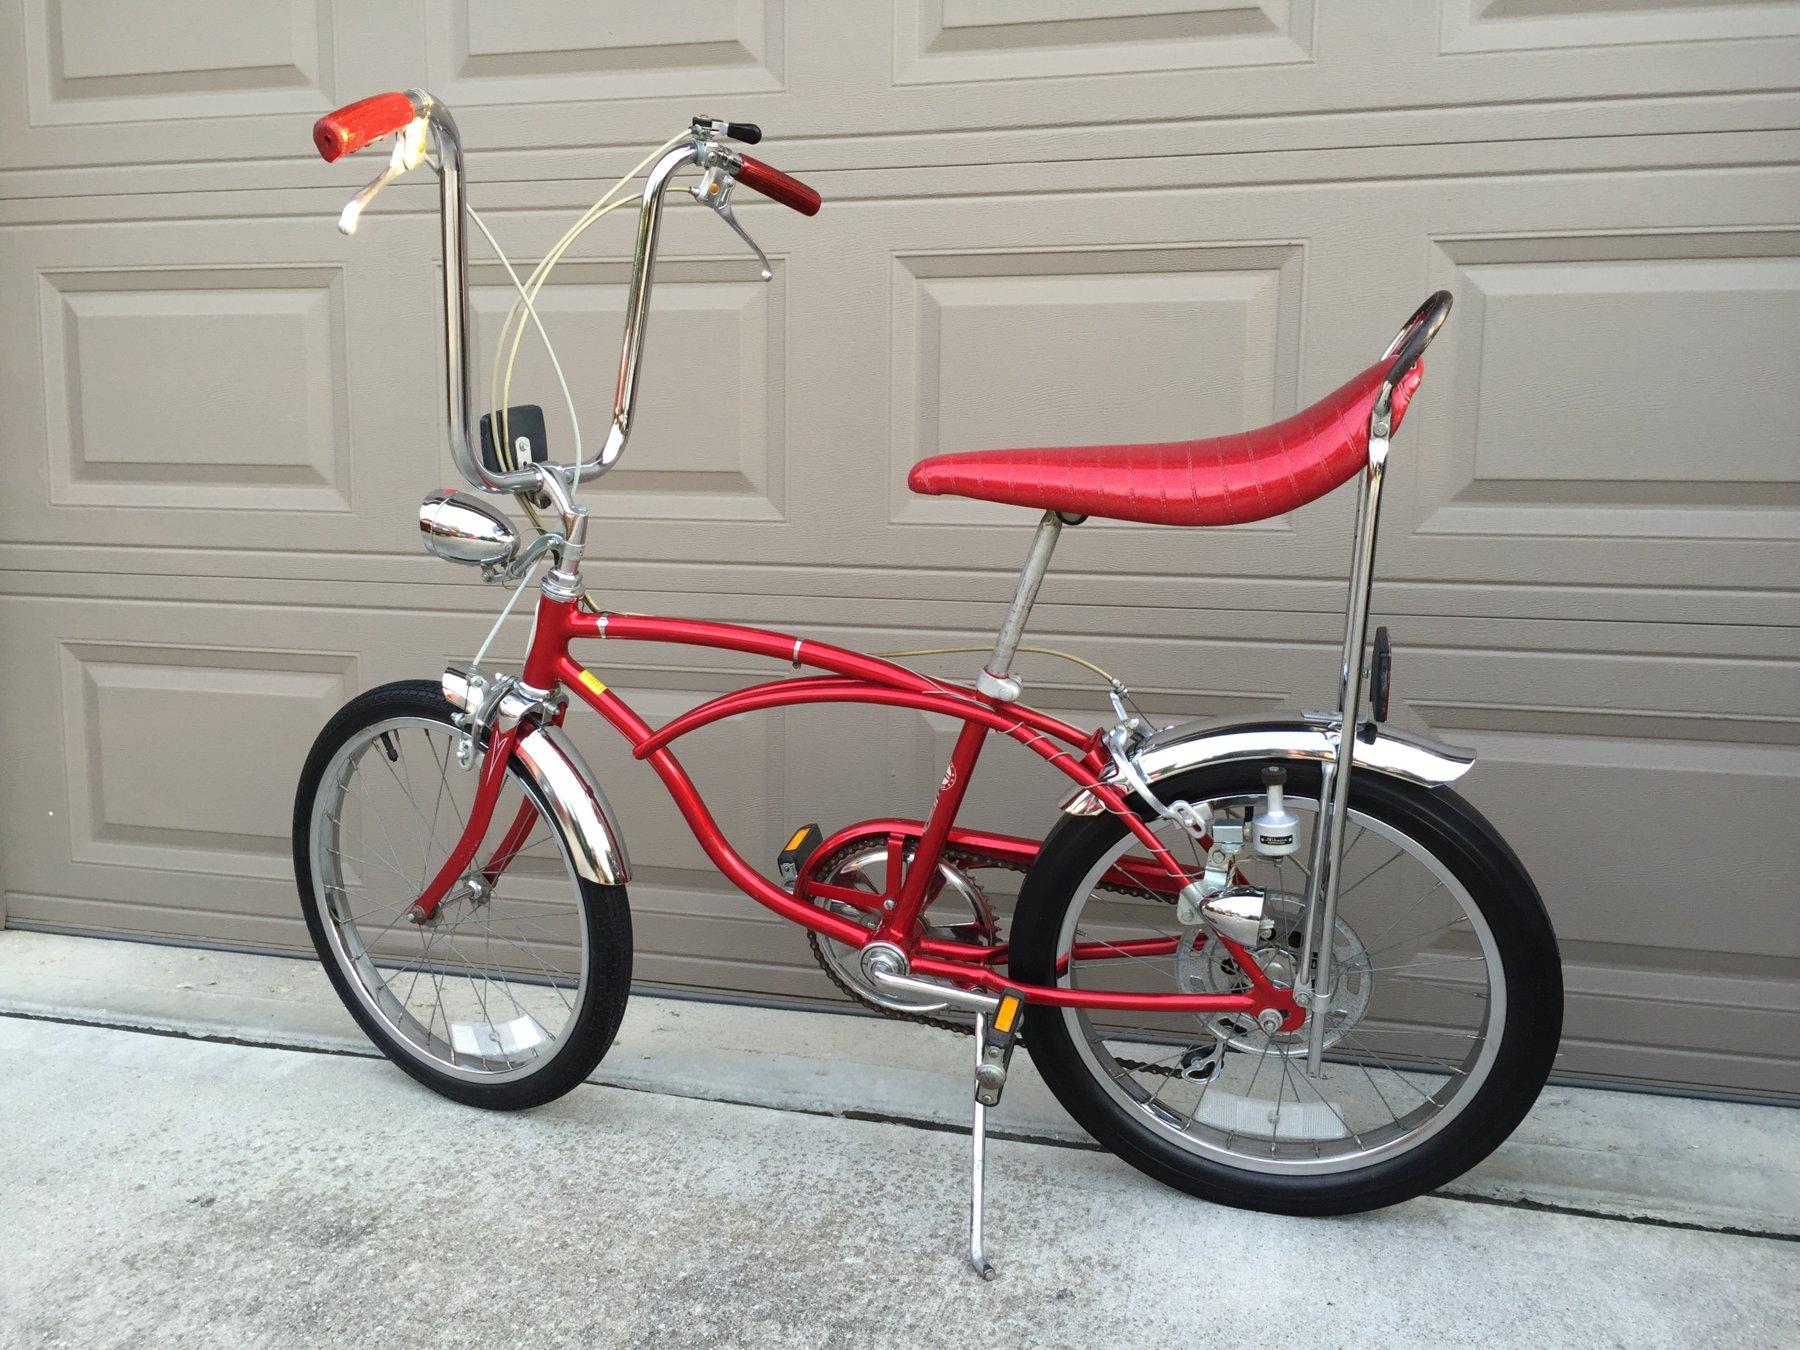 Sold - 1977 Schwinn Stingray 5 Speed Muscle Bike - Excellent